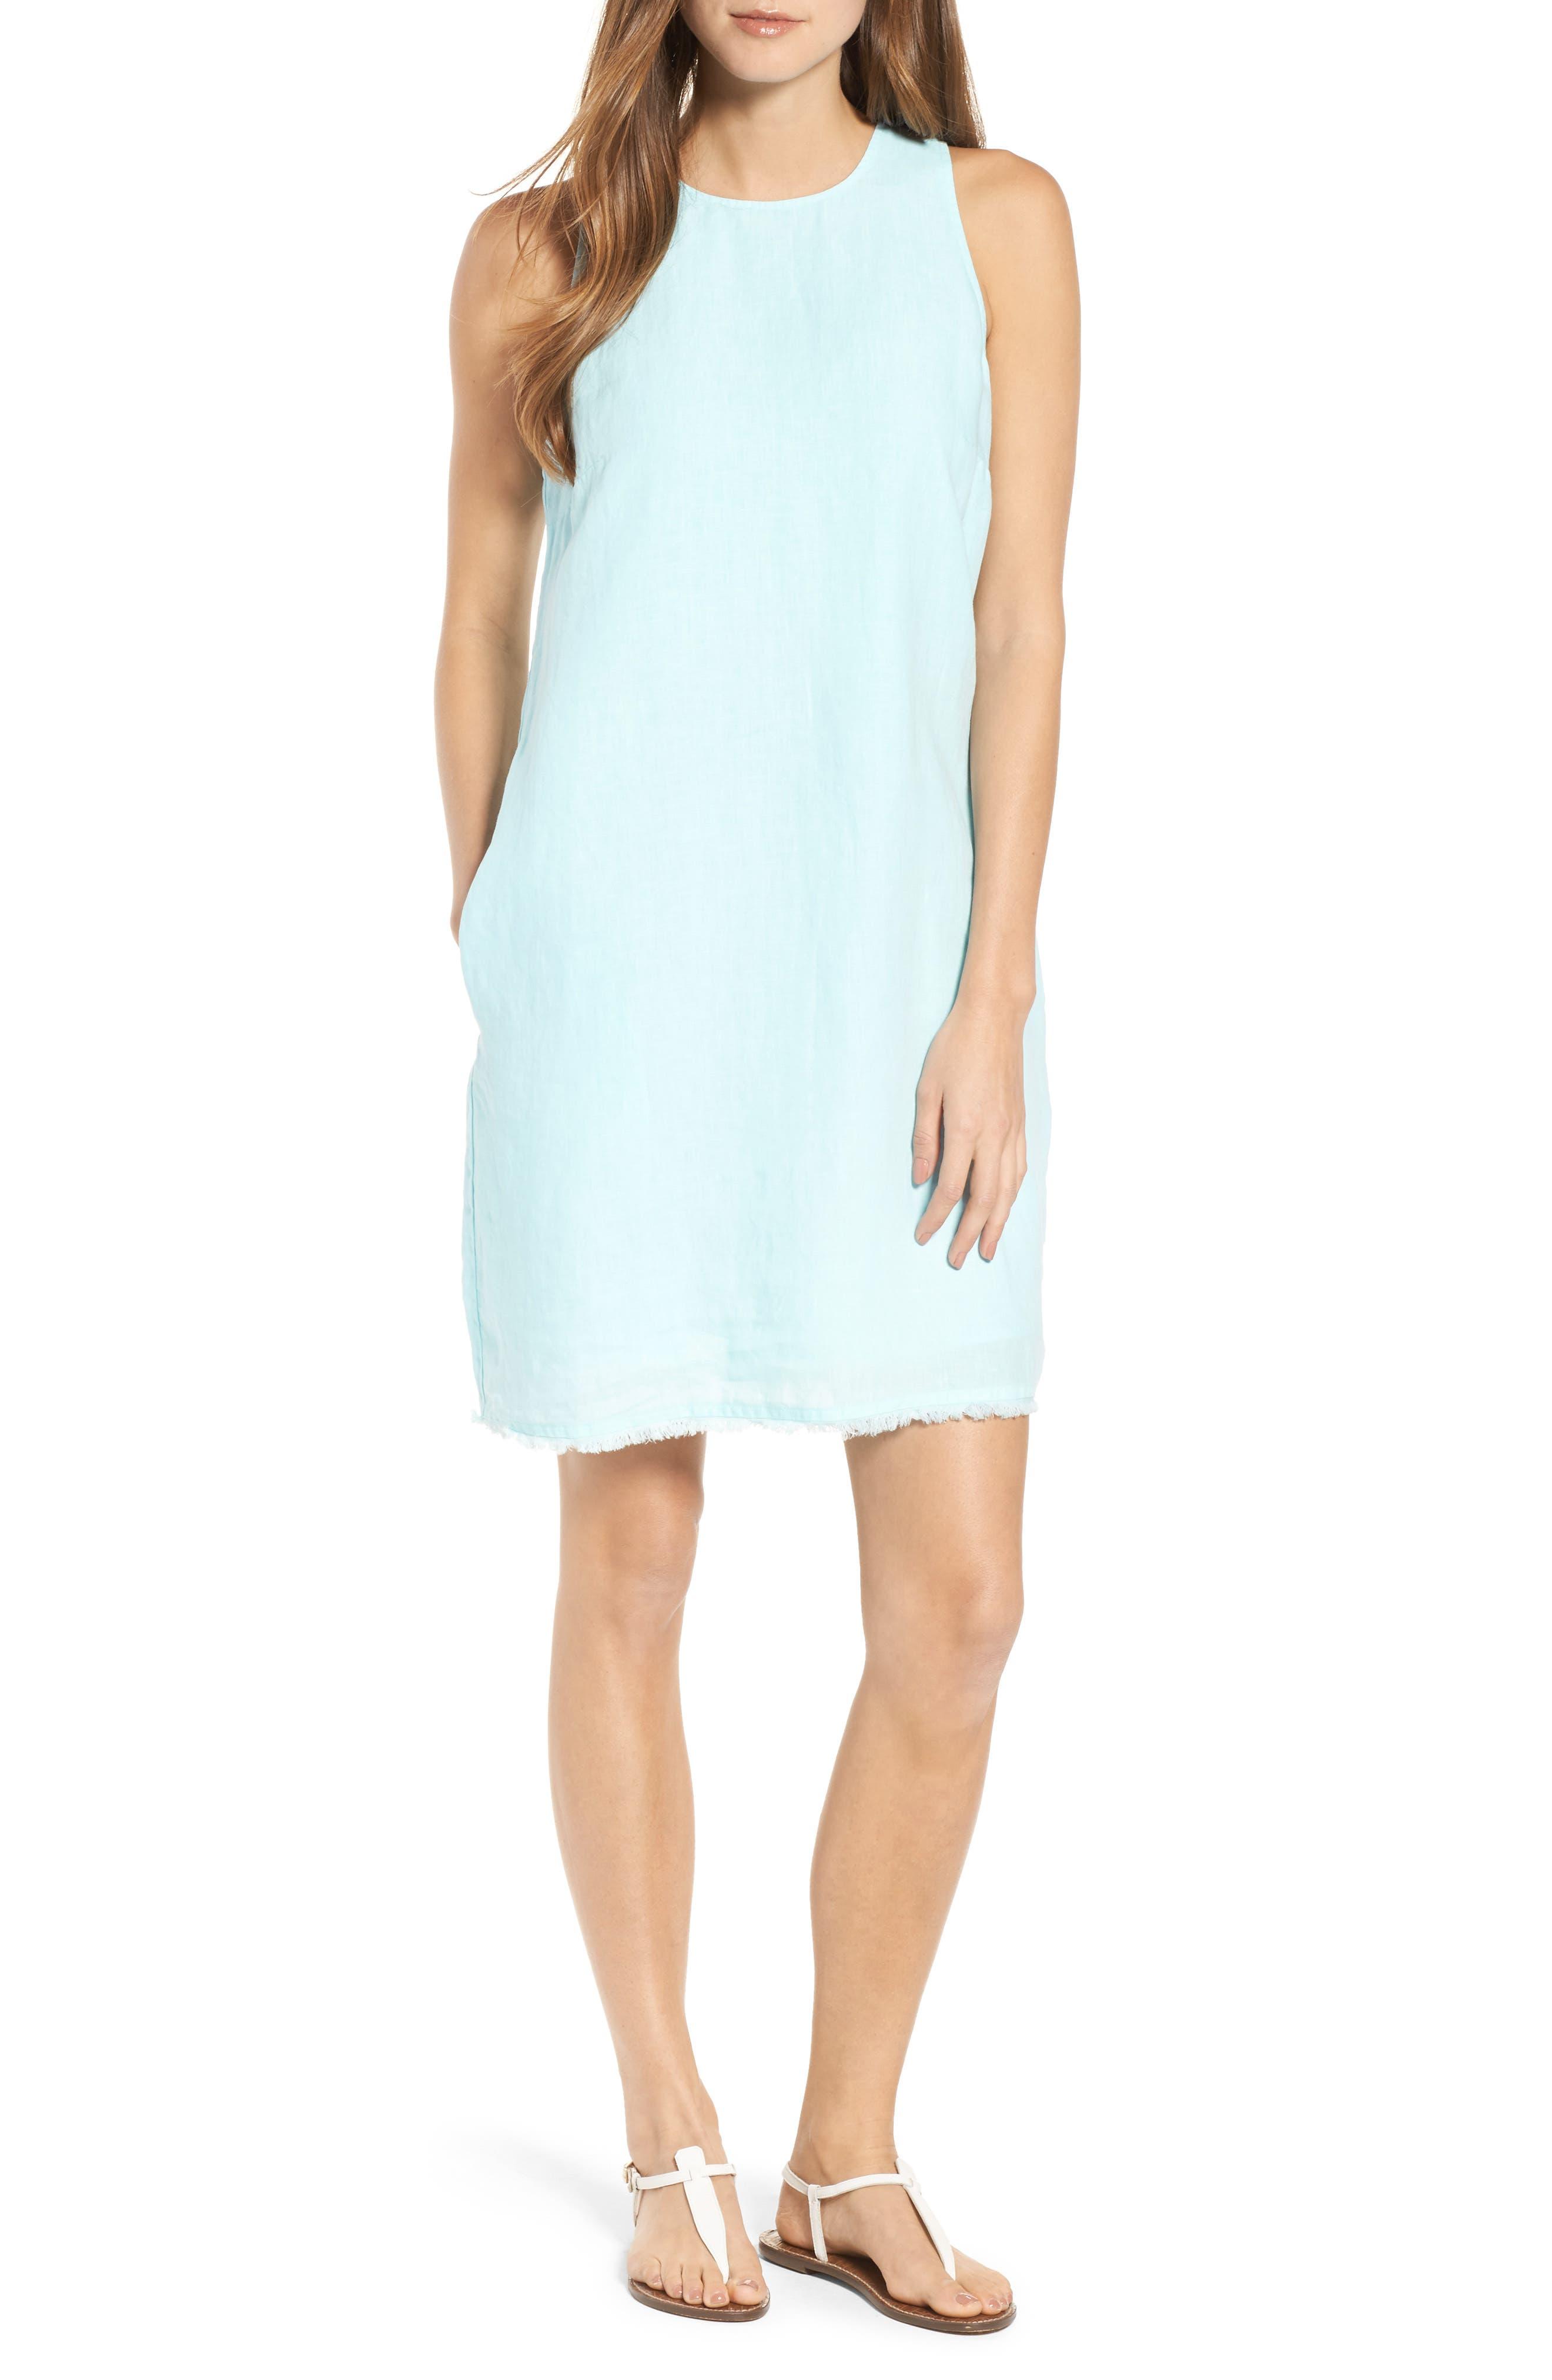 Two Palms Frayed Trim Shift Dress,                         Main,                         color, Aqua Mist